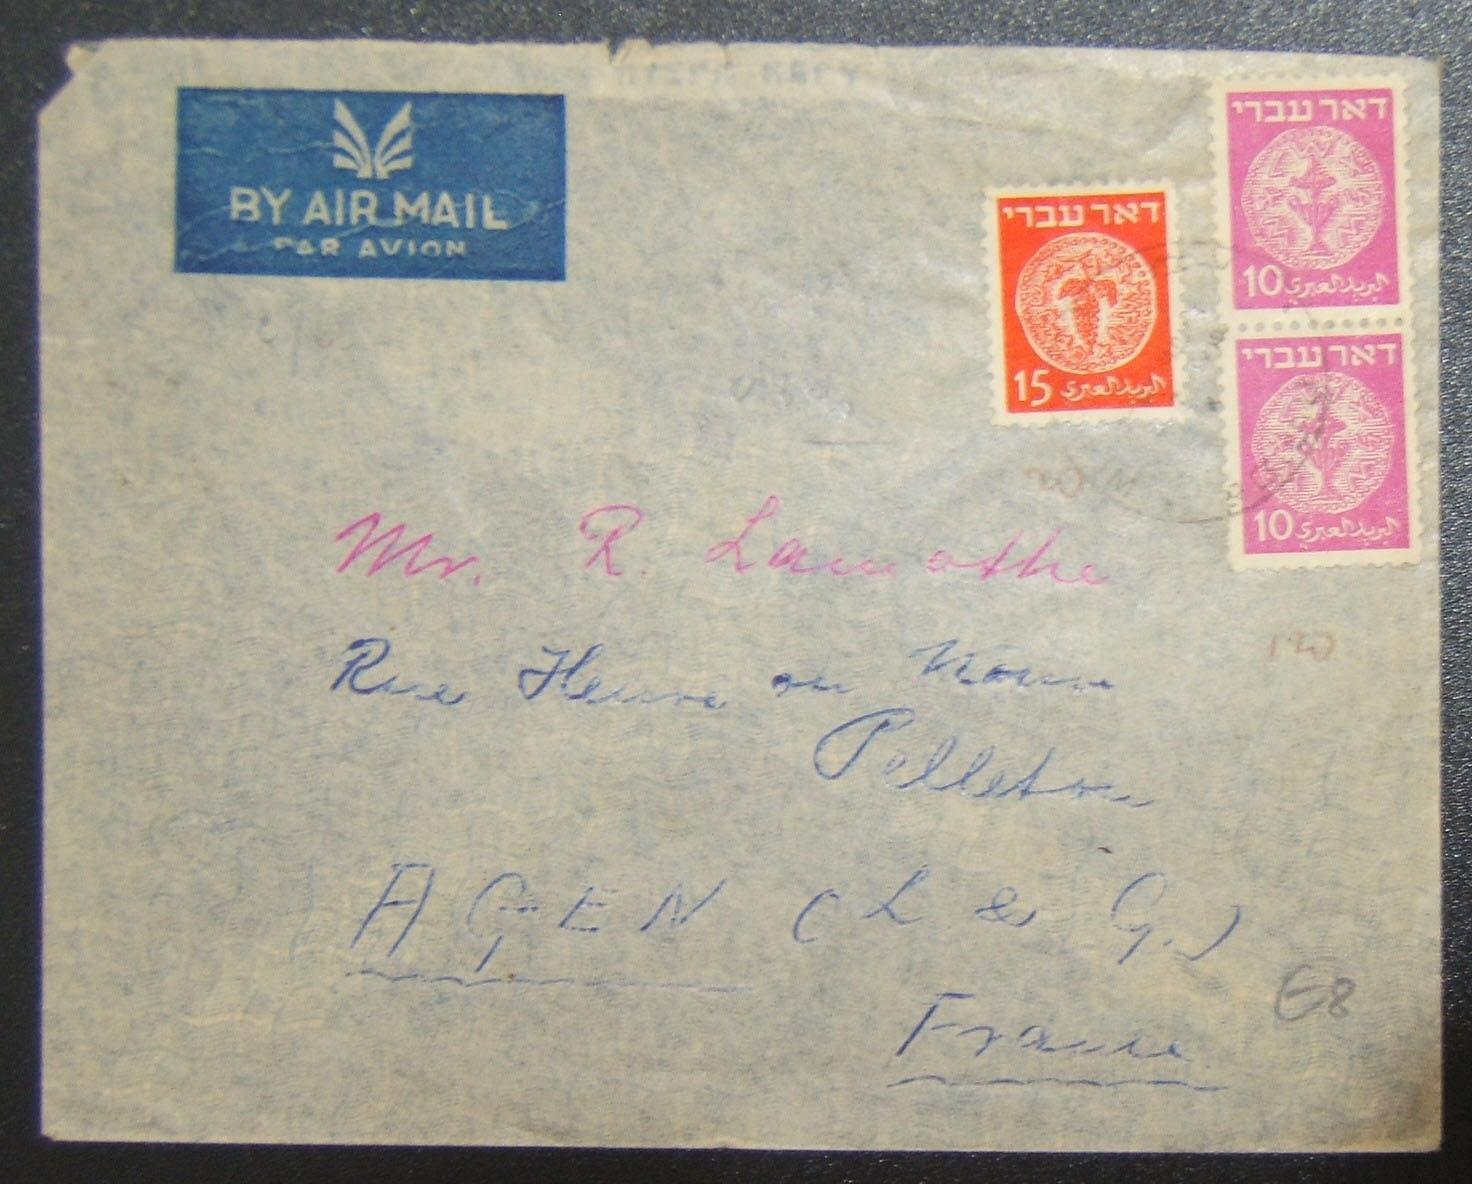 1949 Doar Ivri airmail: 4-7-1949 a/m cv ex AFIKIM (return addressed via Doar Kinneret) to FRANCE franked 35 Pr per FA-2 period letter rate, using vert pair 10pr (gray paper) + 15pr